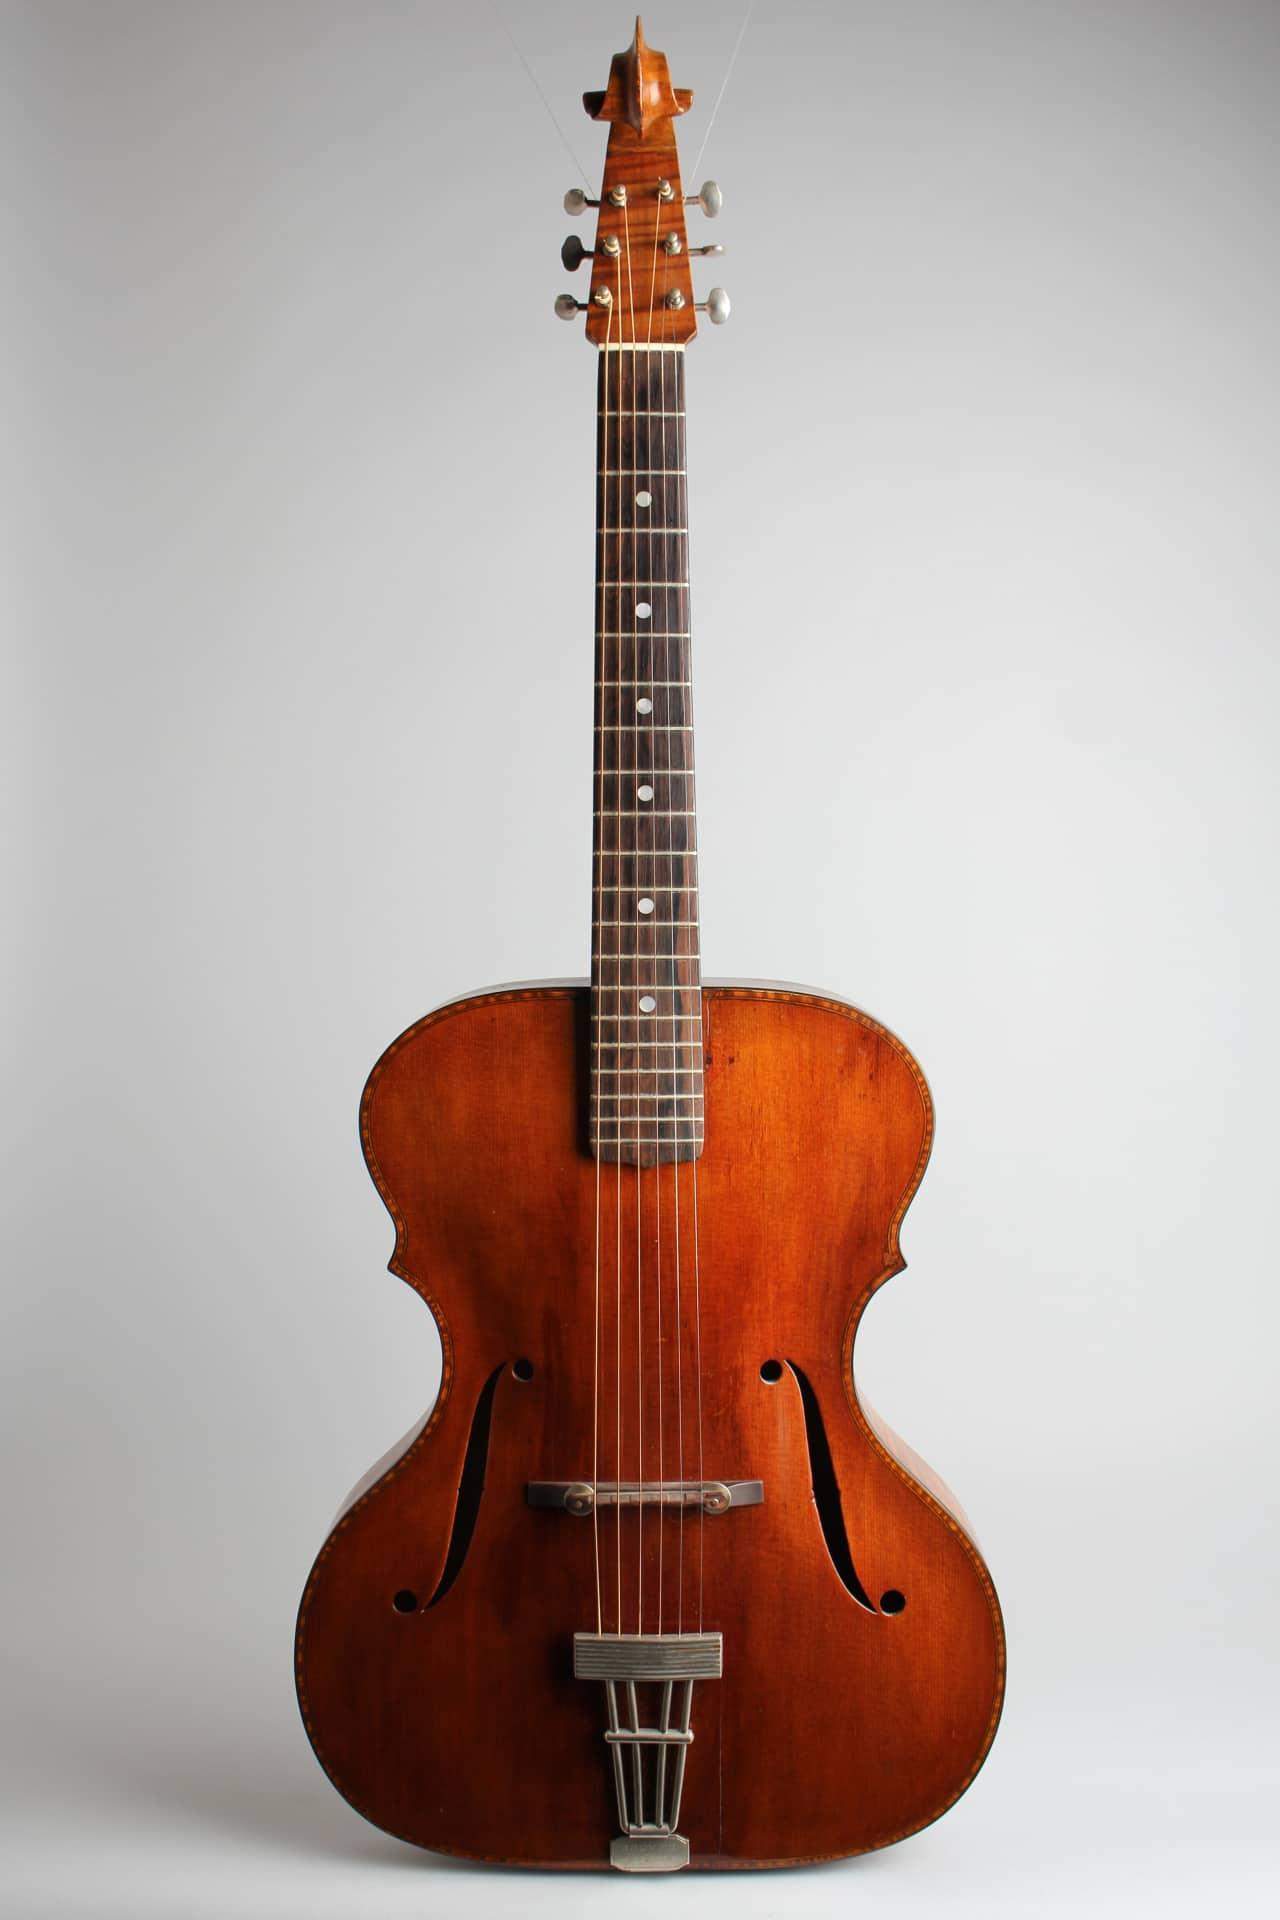 wilkanowski arch top acoustic guitar 1937 gig bag case. Black Bedroom Furniture Sets. Home Design Ideas